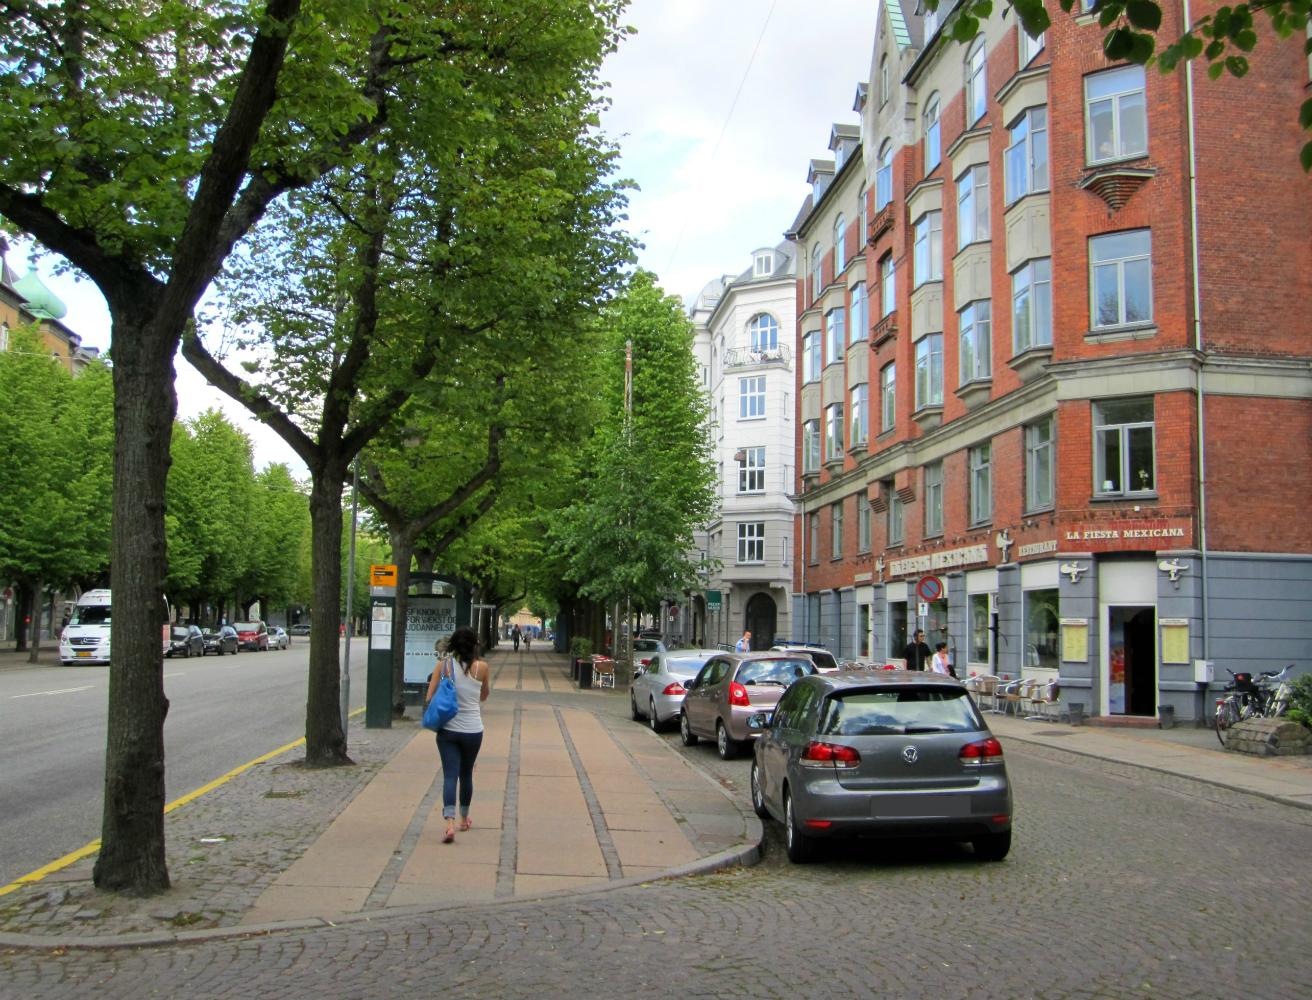 Pfa buys copenhagen resi portfolio for 195m propertyeu for Pension kopenhagen